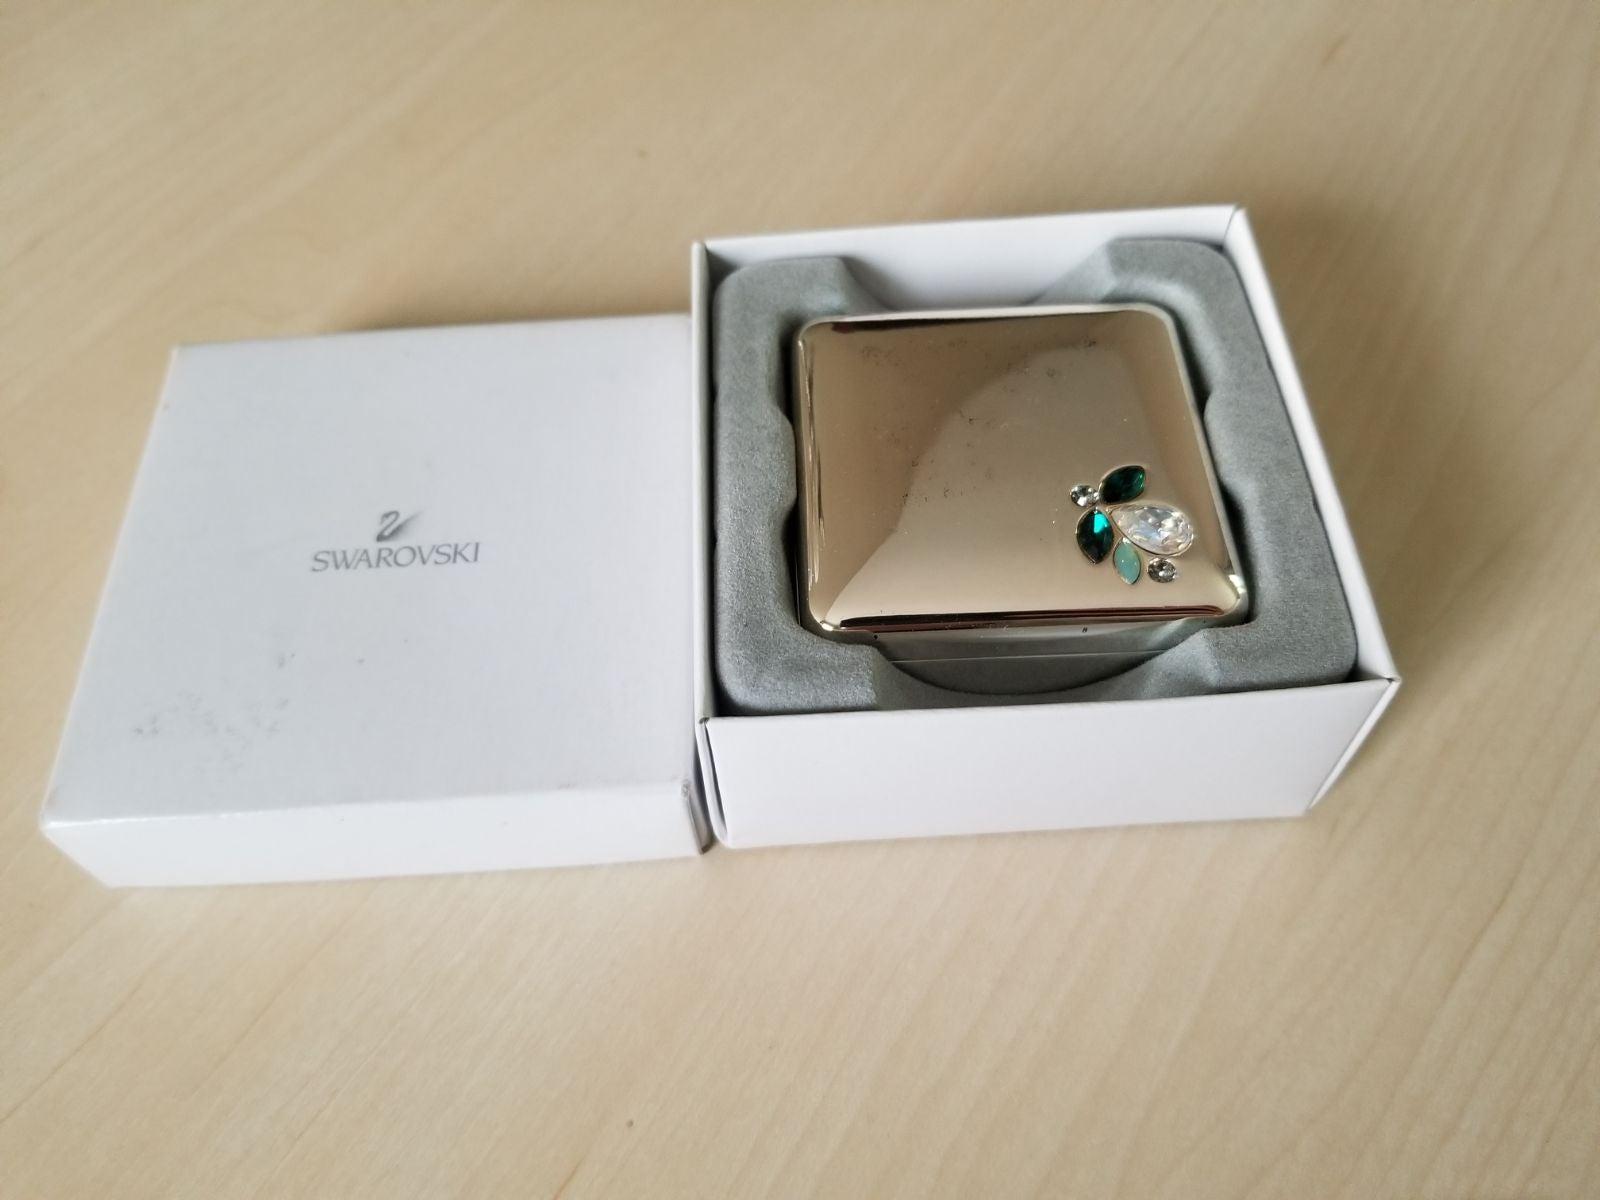 Swarovski jewelry box